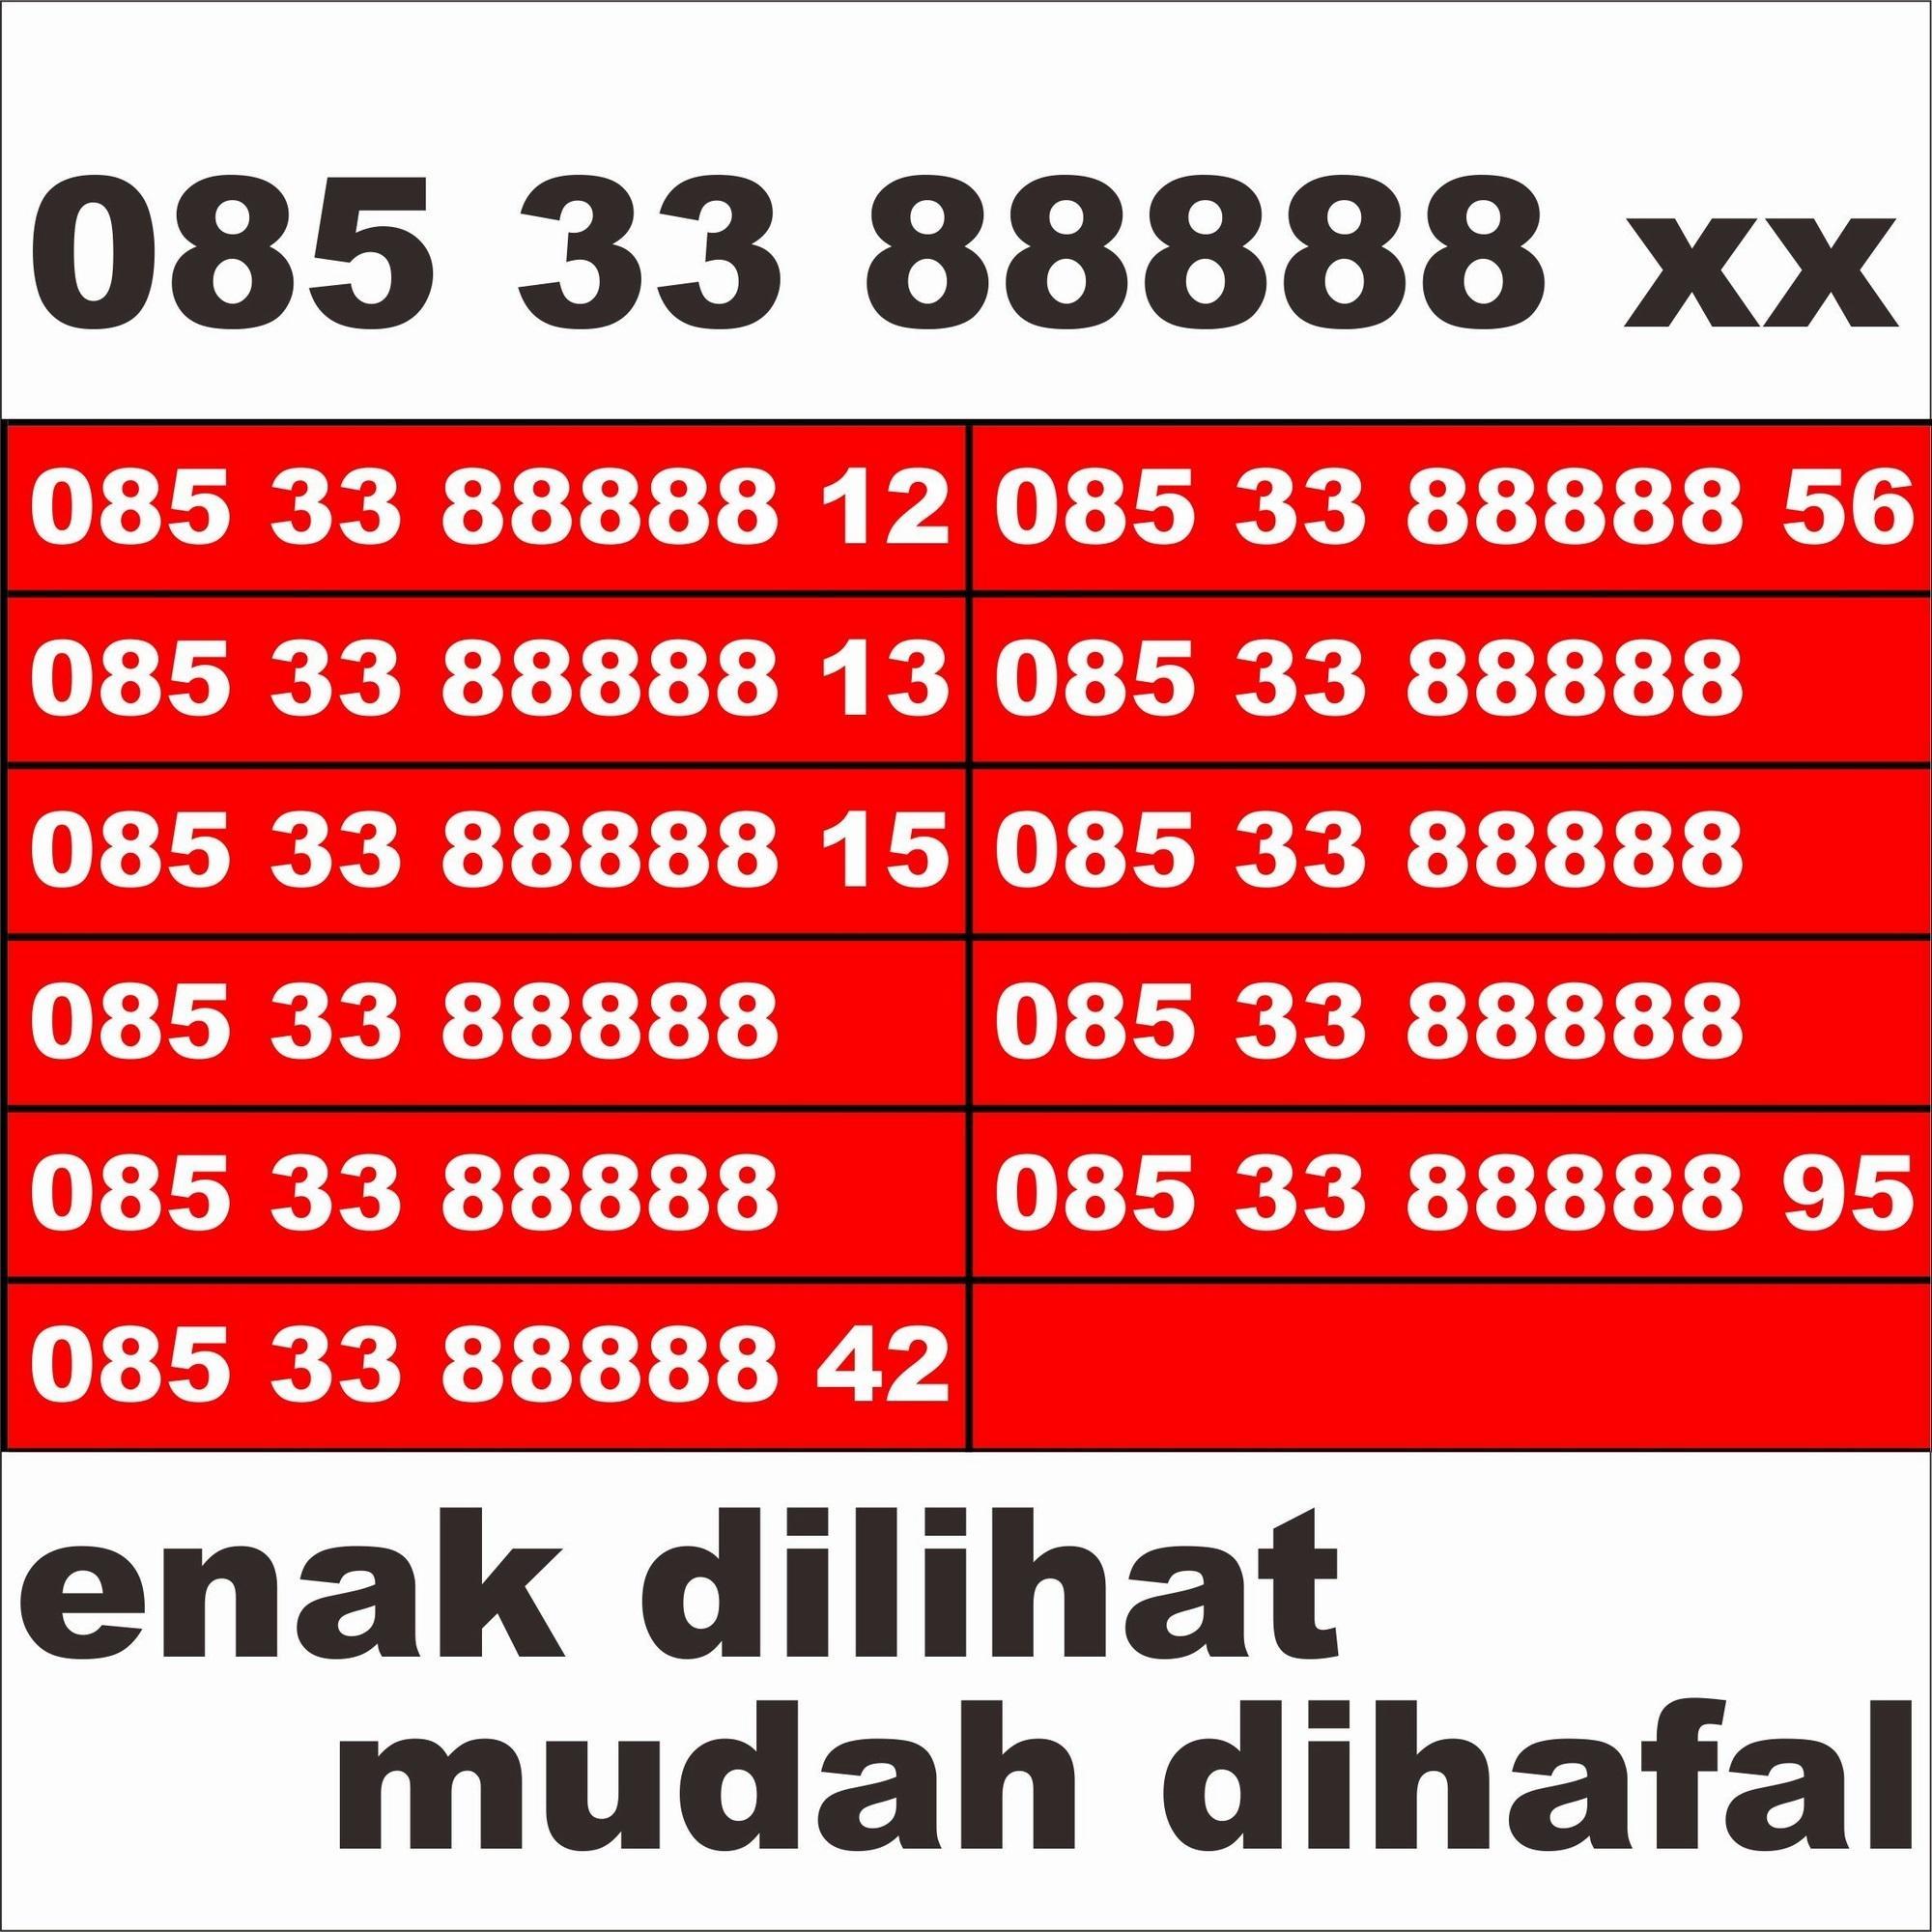 Kartu perdana nomer cantik nomor cantik pilihan telkomsel as kartu prabayar super istimewa hoki hoky ENAK